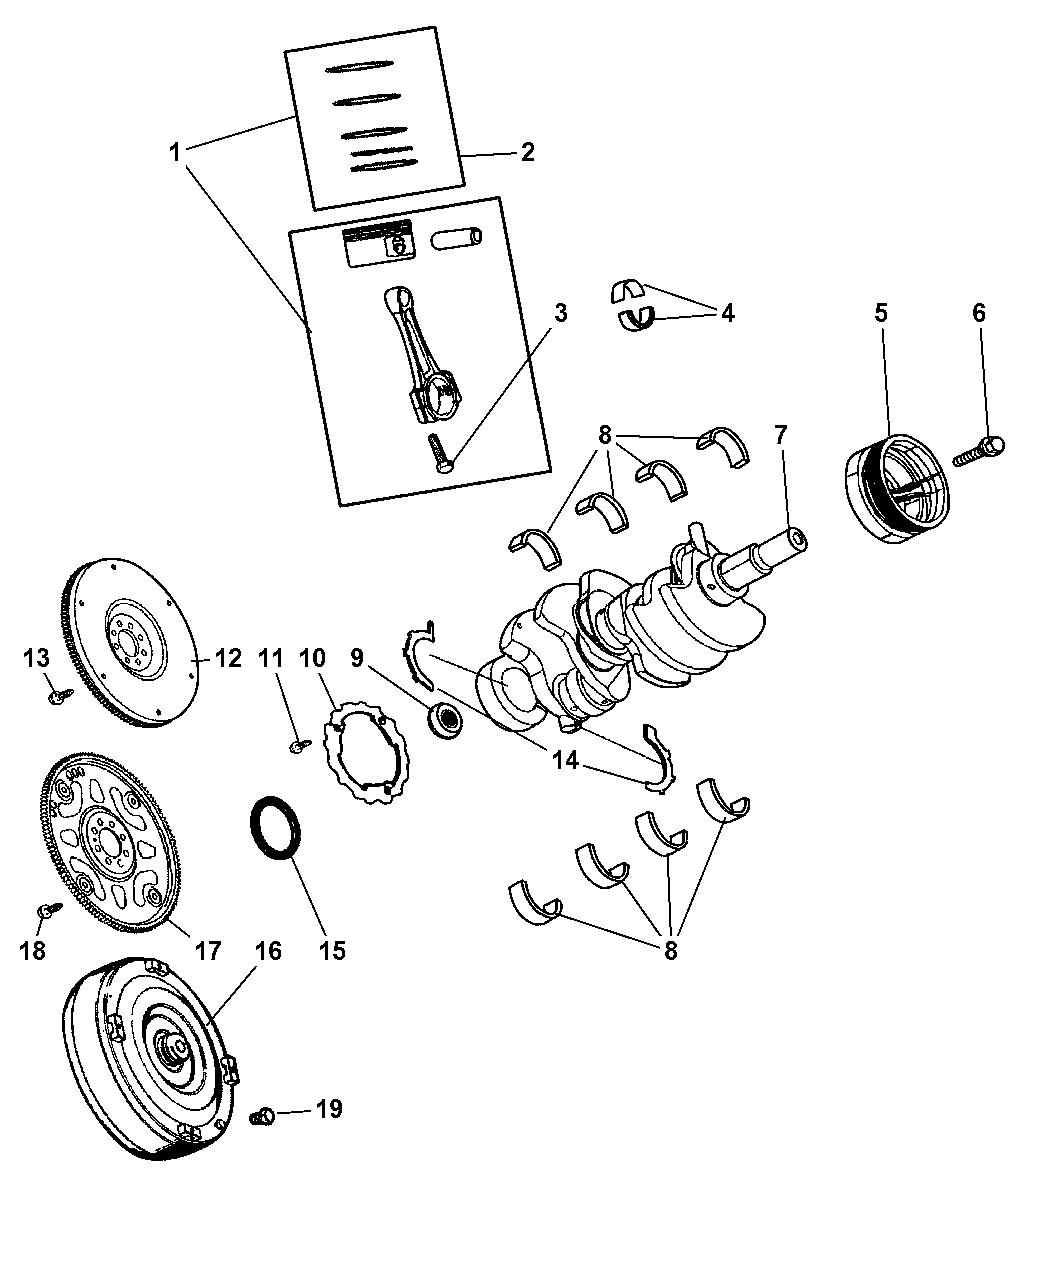 2006 Jeep Commander Engine Diagram